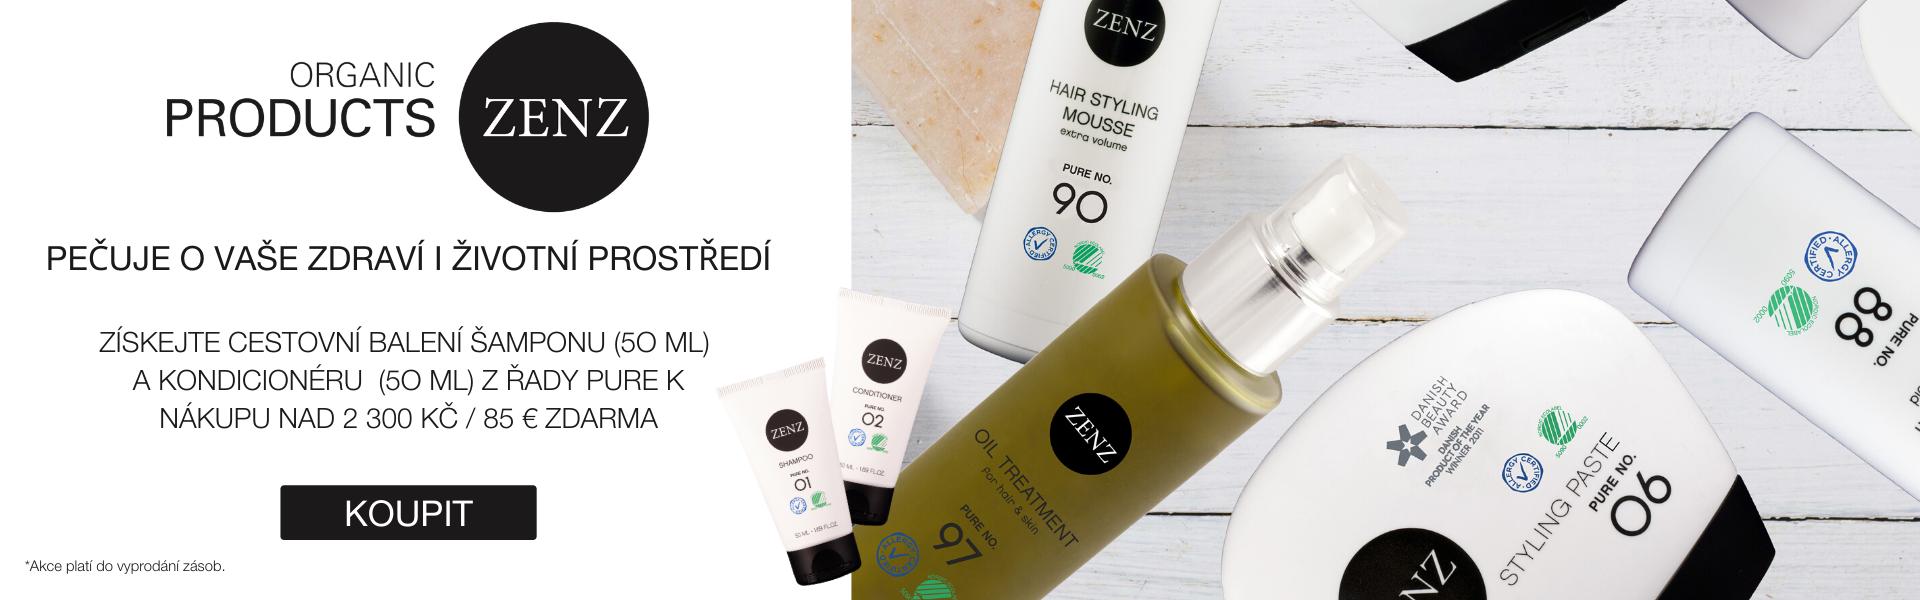 Získejte cestovní balení šamponu (5O ml)  a kondicionéru  (5O ml) z řady PURE k nákupu nad 2 300 Kč / 85 € zdarma